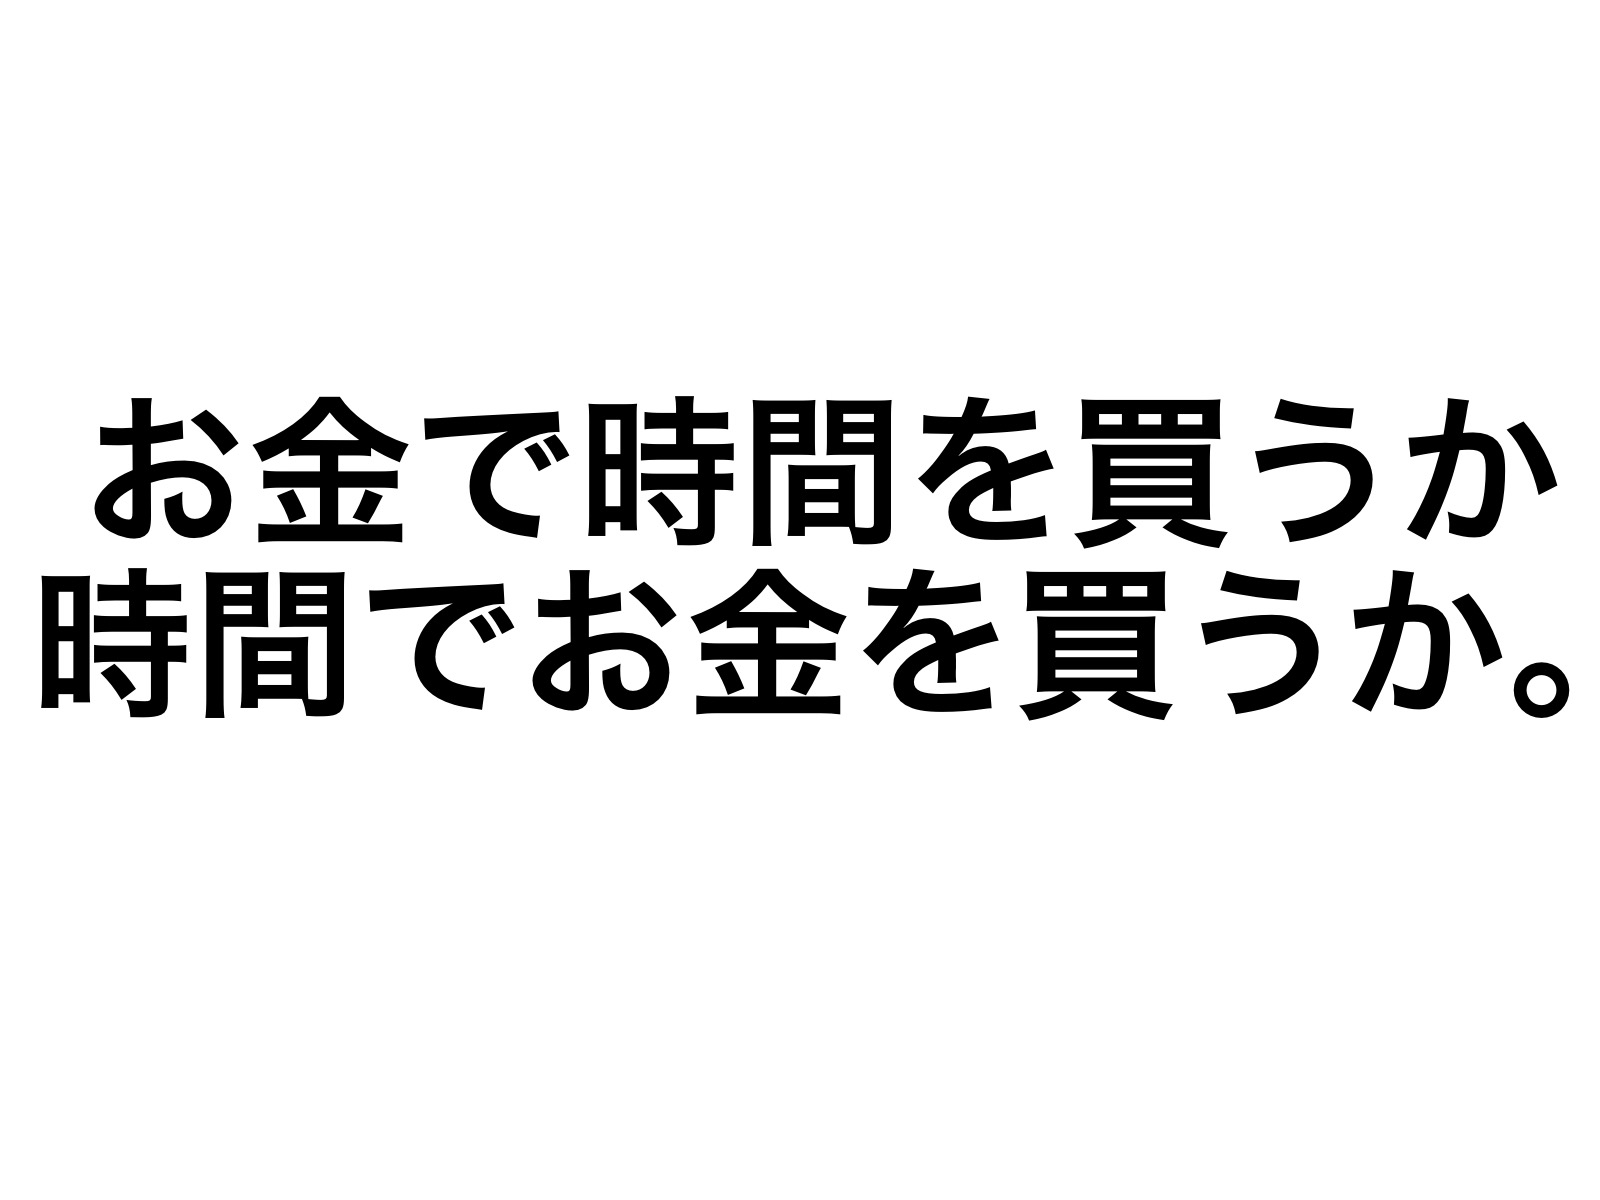 2016 09 03 20 14 54